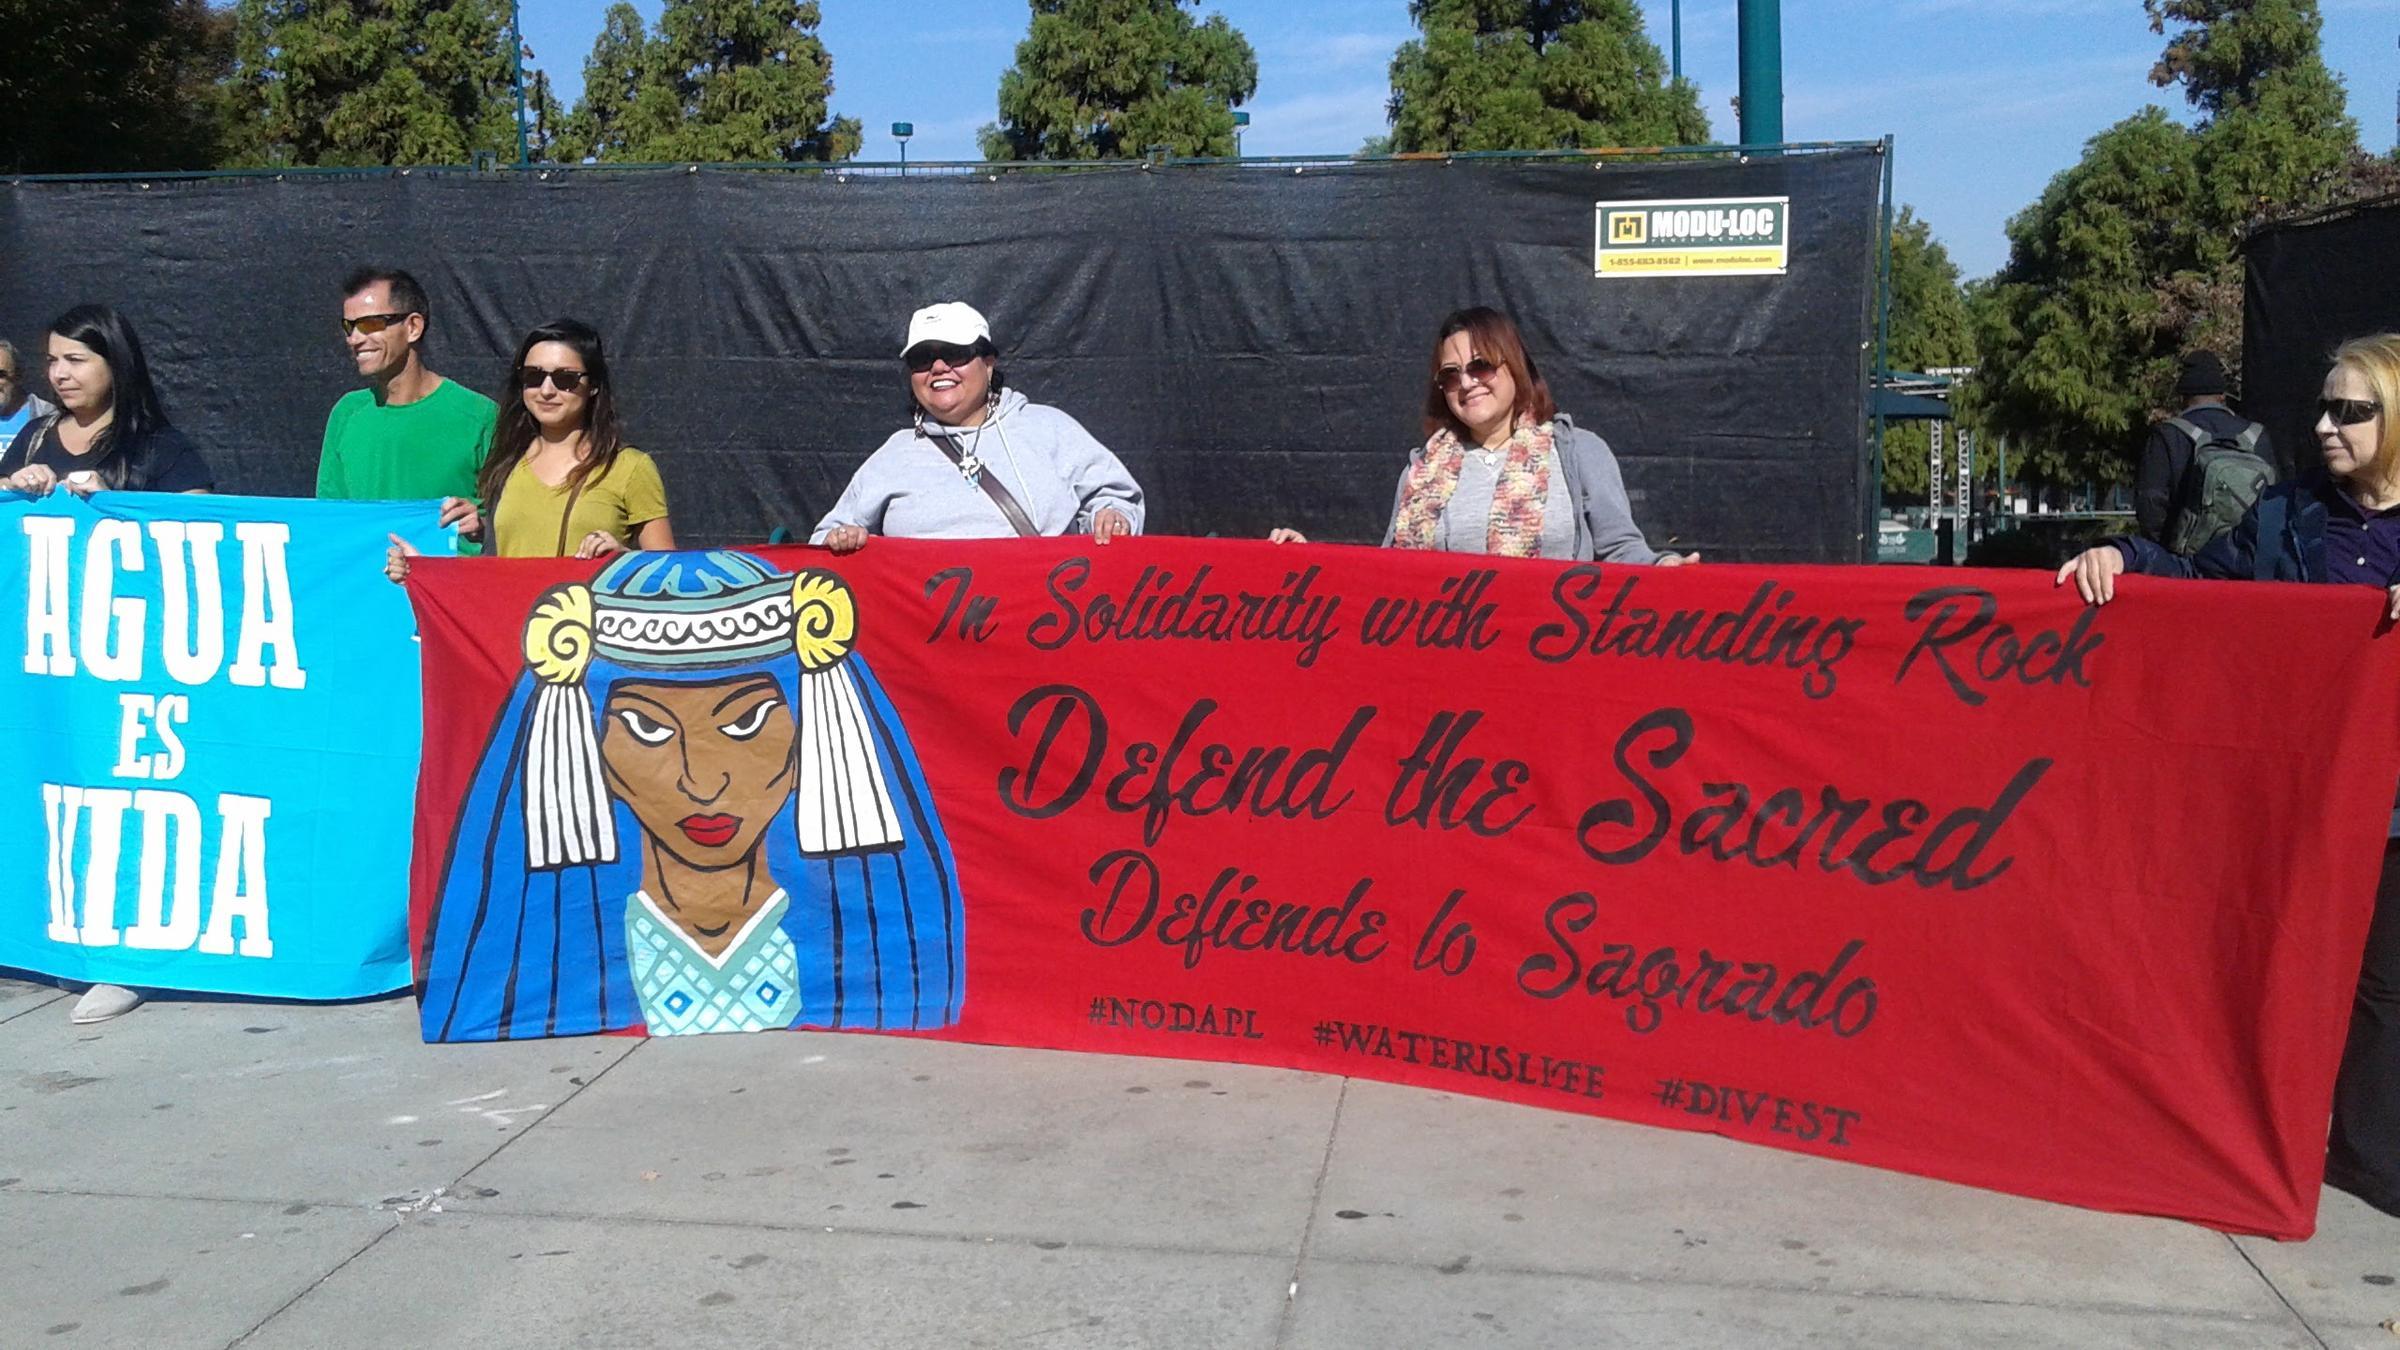 Atlantans March To Protest Dakota Access Pipeline Project